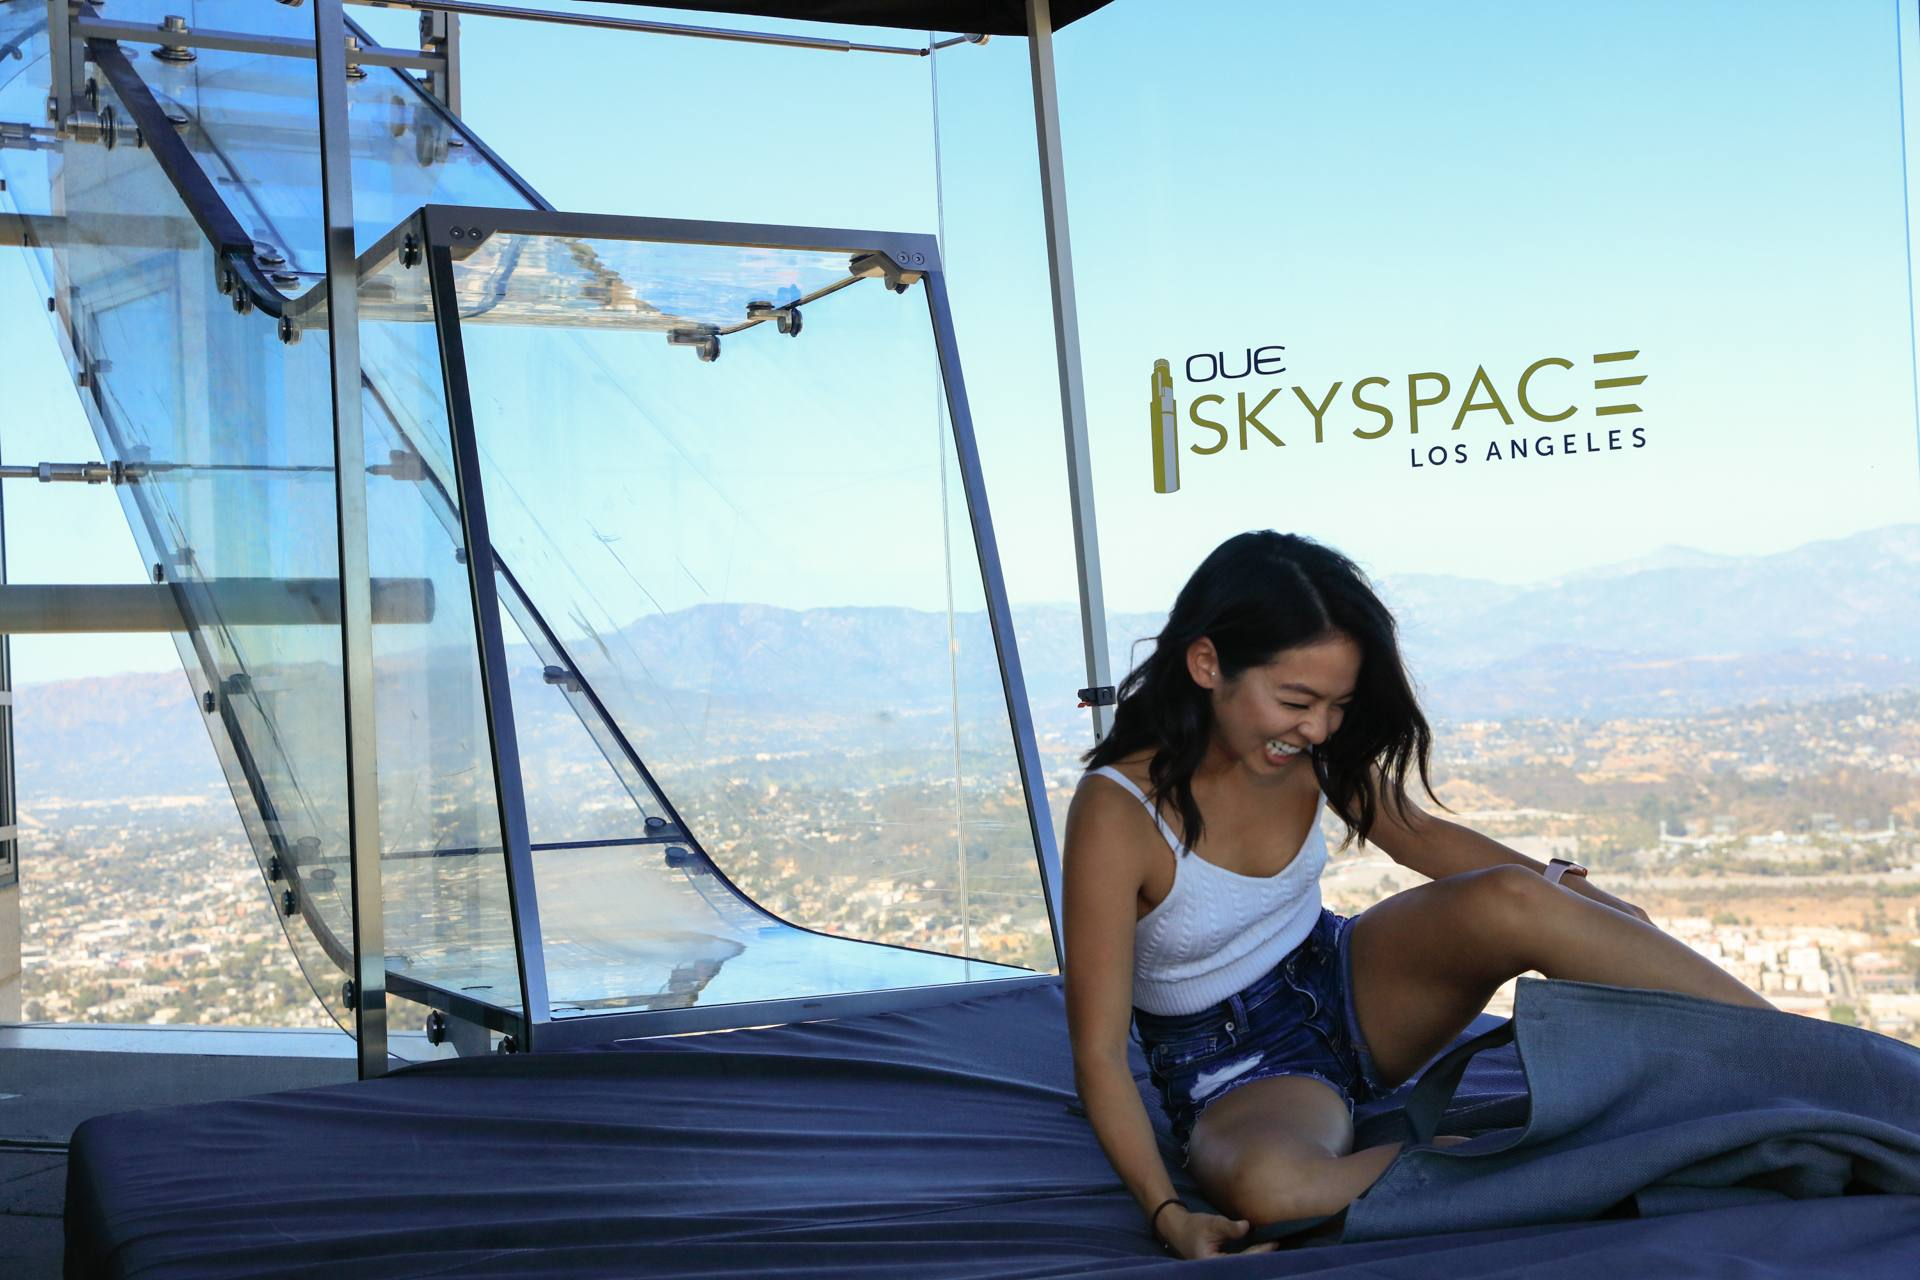 kySlide à OUE Skyspace   |  Photo: Yuri Hasegawa